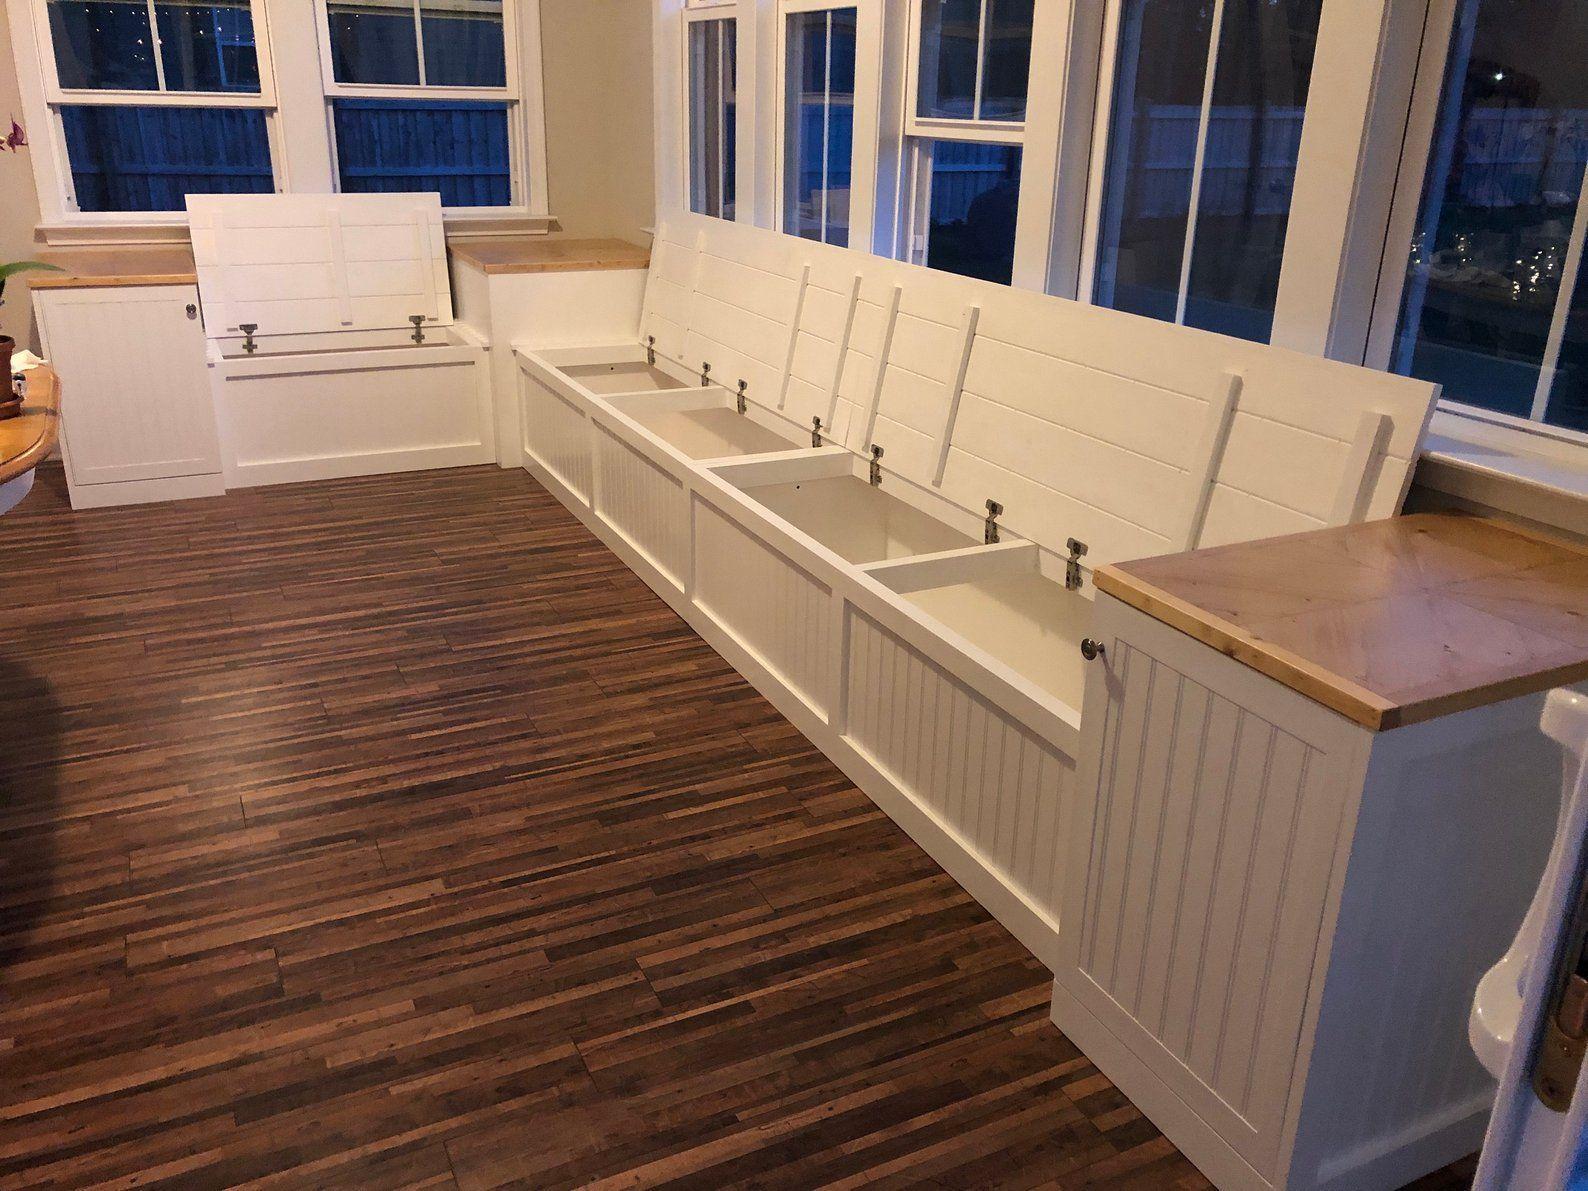 Banquette Corner Bench Kitchen Seating L Shaped Bench Breakfast Nook Kitchen Nook Bench With In 2020 Kitchen Seating Banquette Seating In Kitchen Kitchen Nook